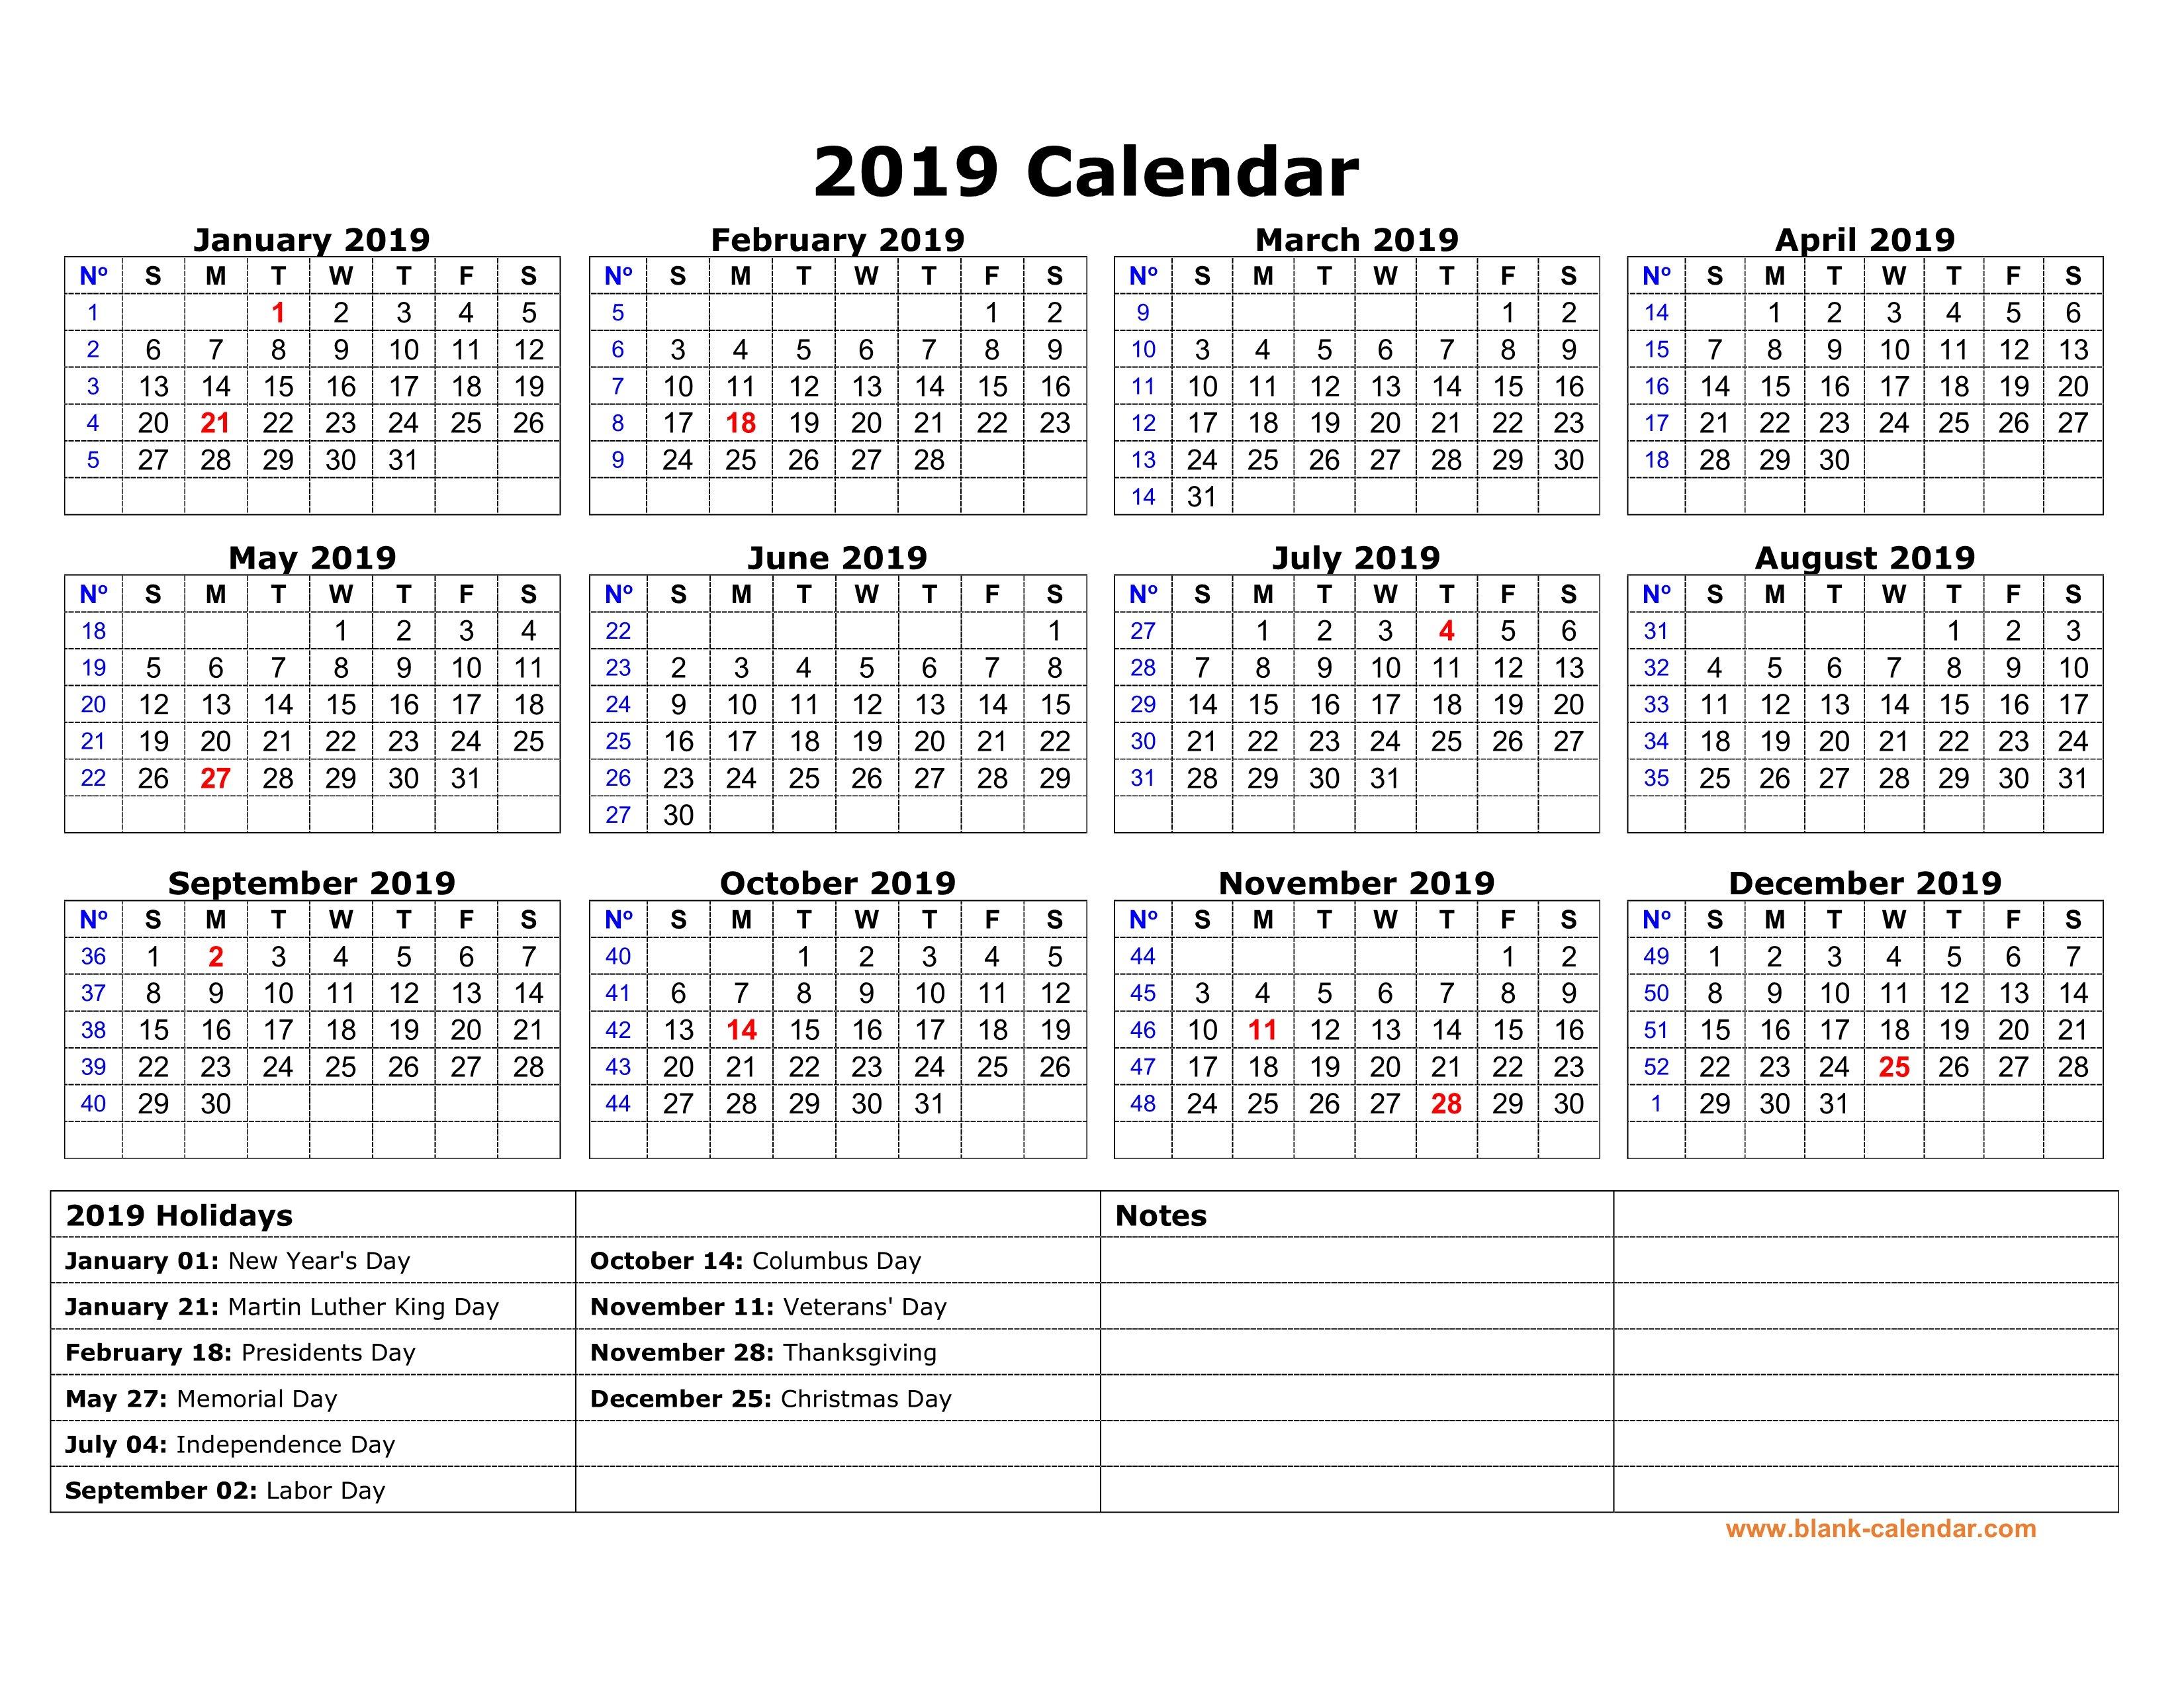 Free Download Printable Calendar 2019 With Us Federal Holidays, One Calendar 2019 Holidays Usa